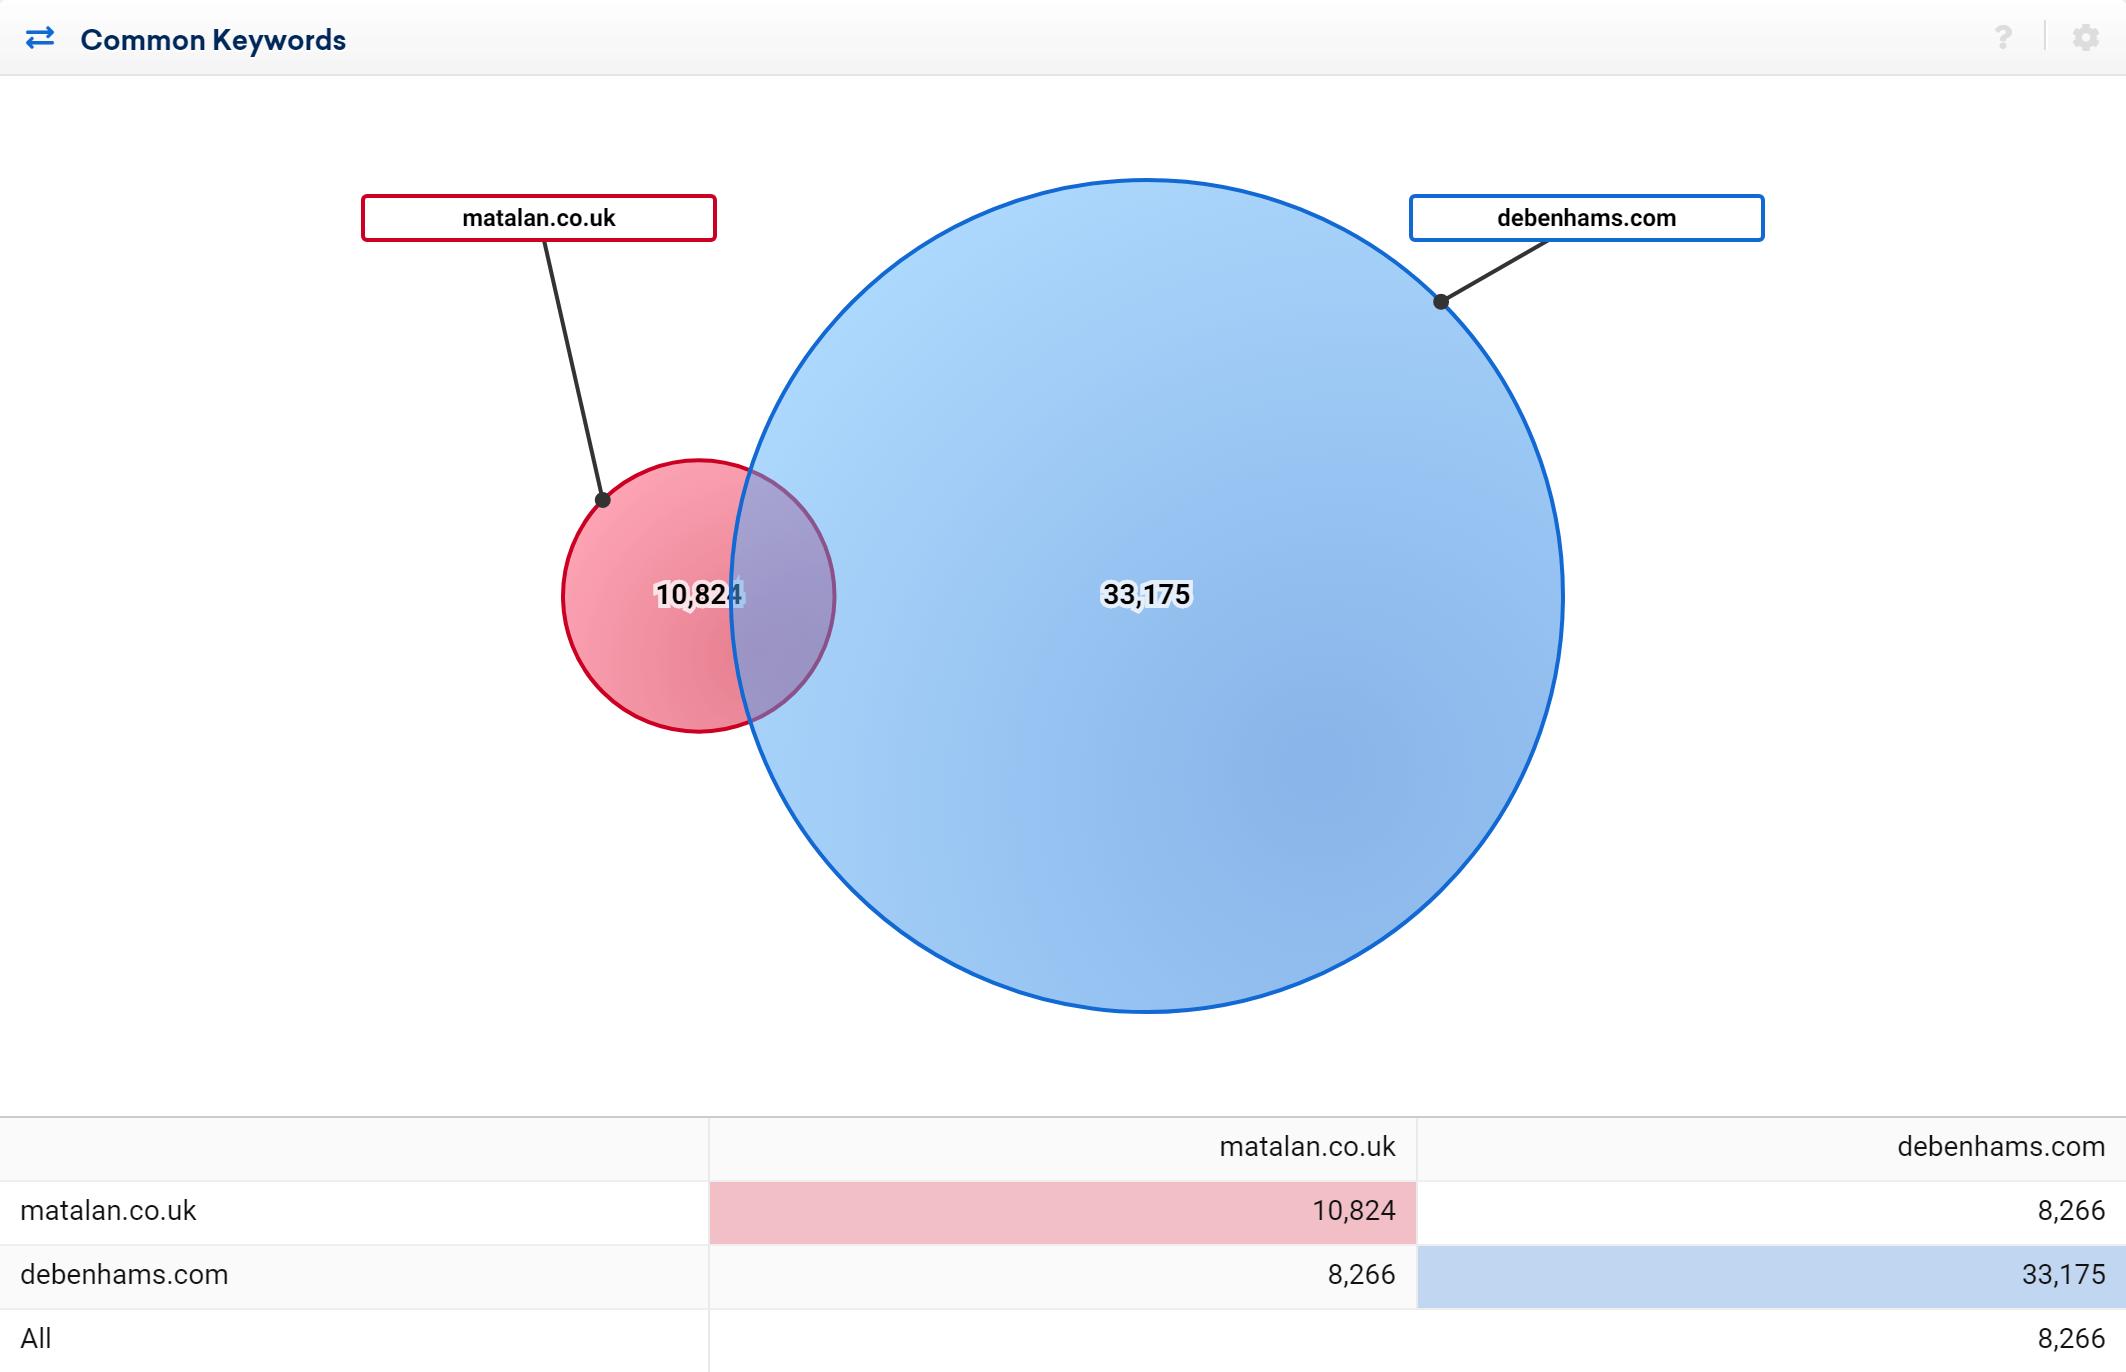 Comparison between matalan.co.uk and debenhams.com in 2017